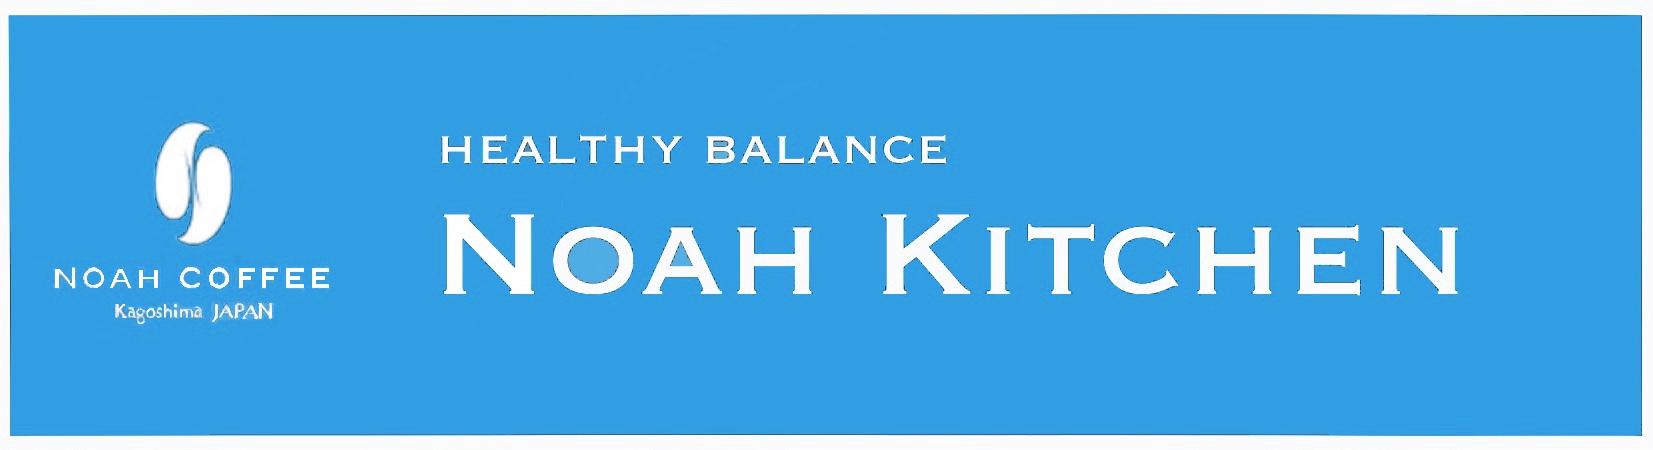 Noah Kitchen